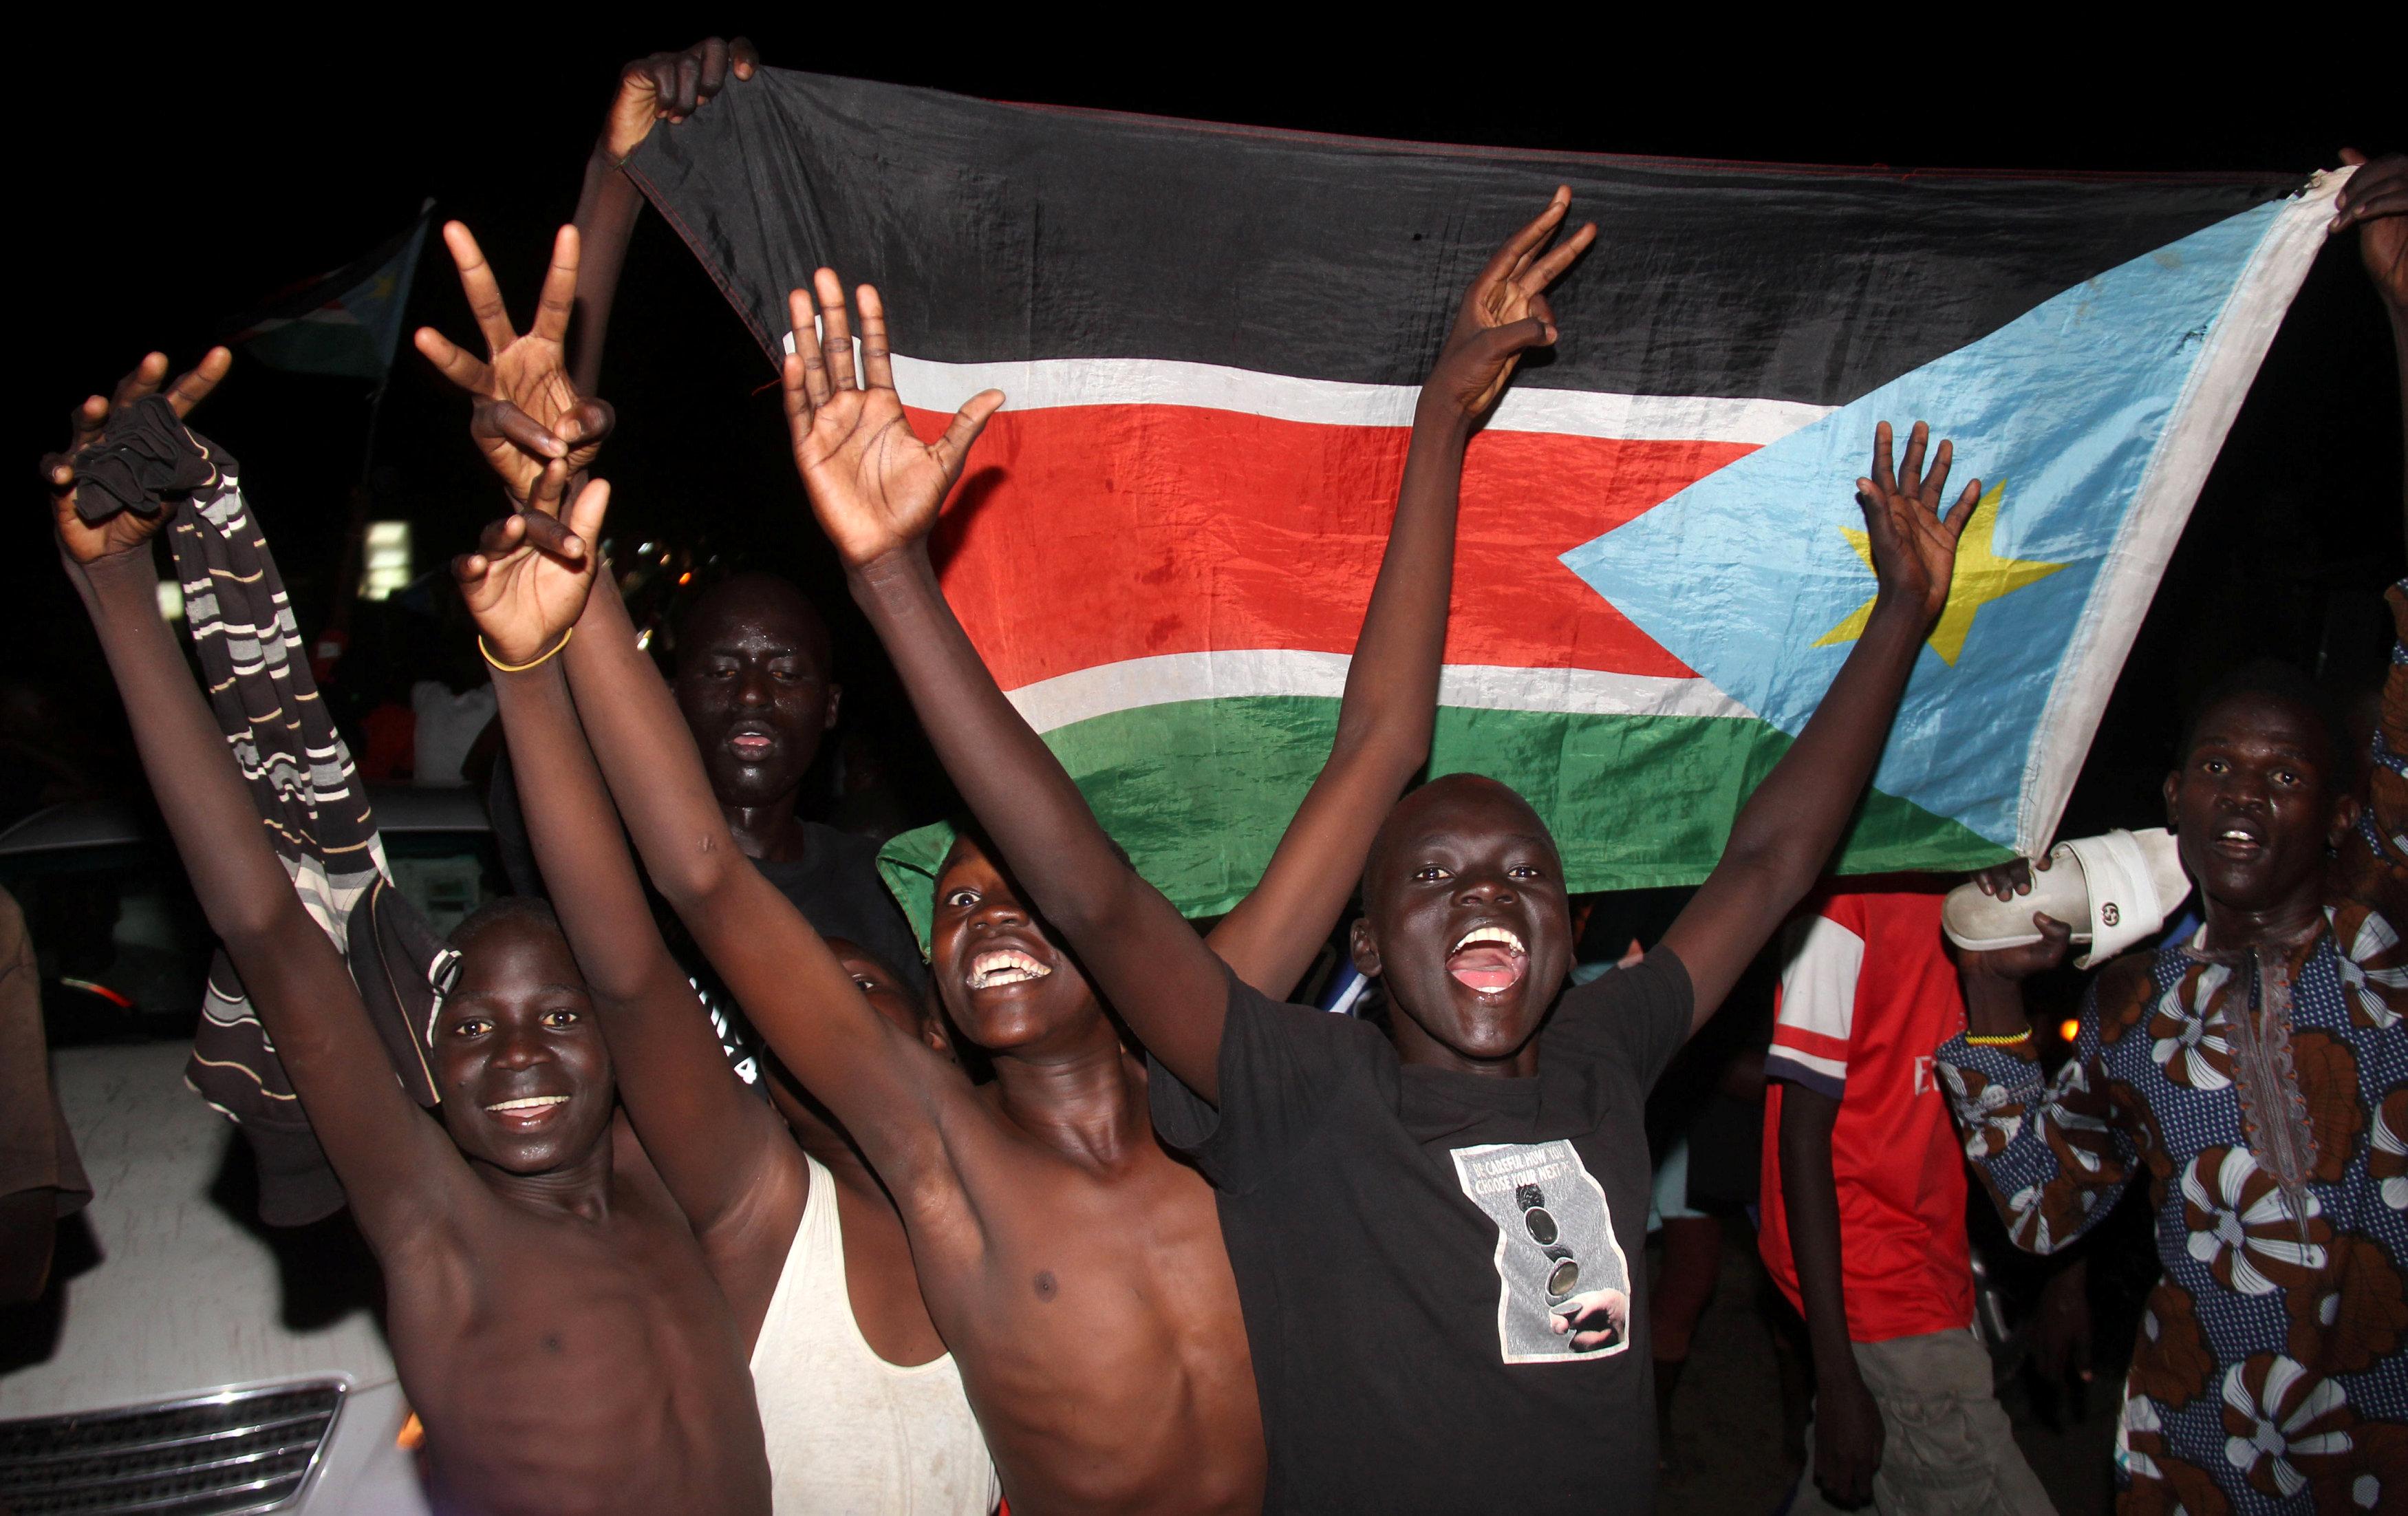 احتفالات بين مواطنى جنوب السودان